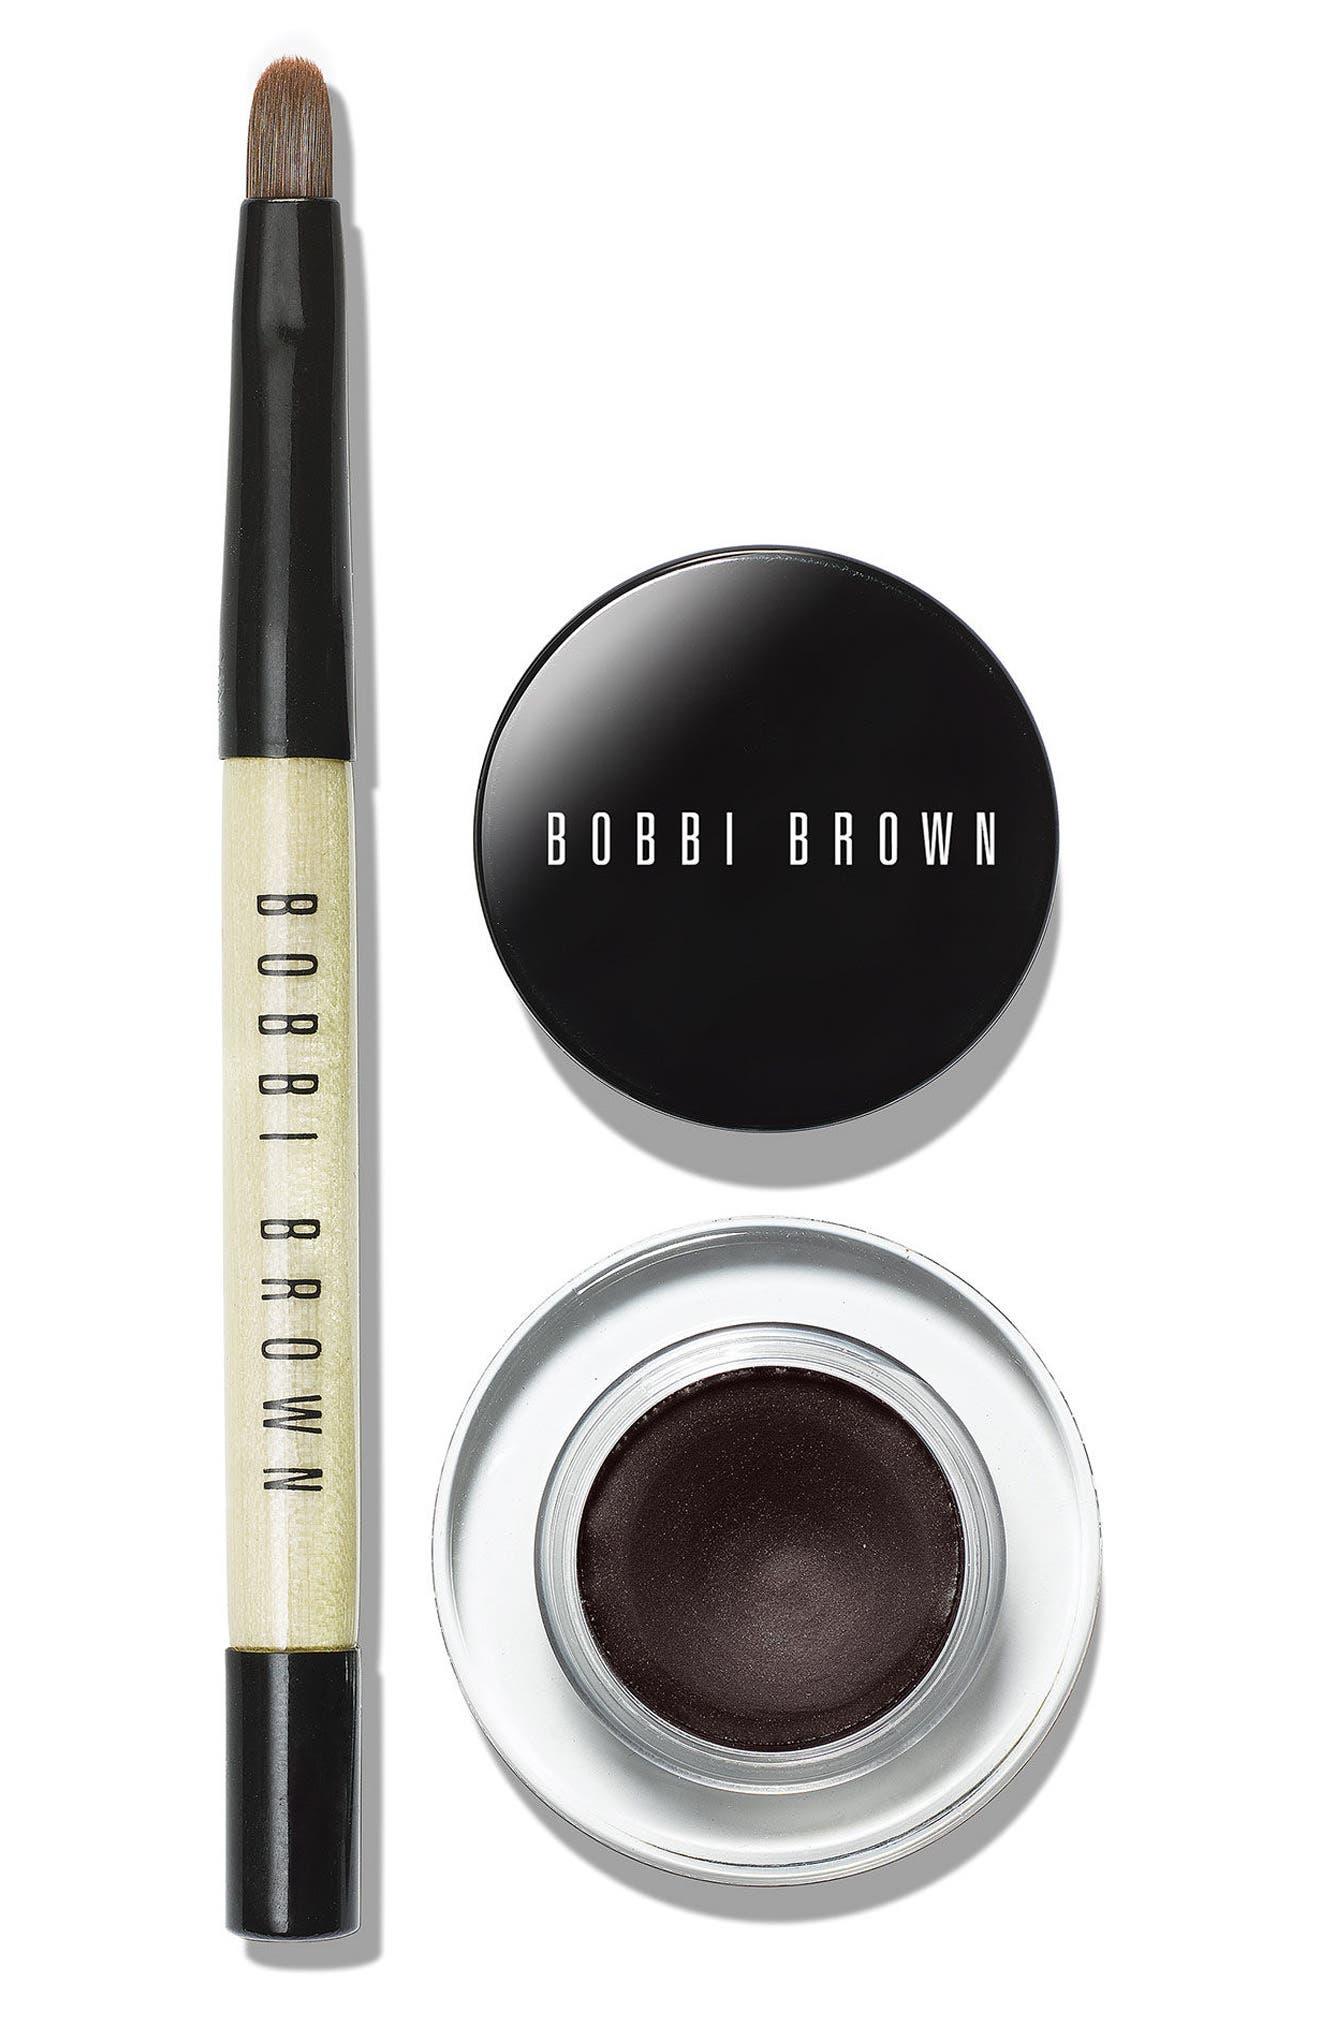 Bobbi Brown Bobbi to Go Mini Long-Wear Gel Eyeliner Duo ($27 Value)